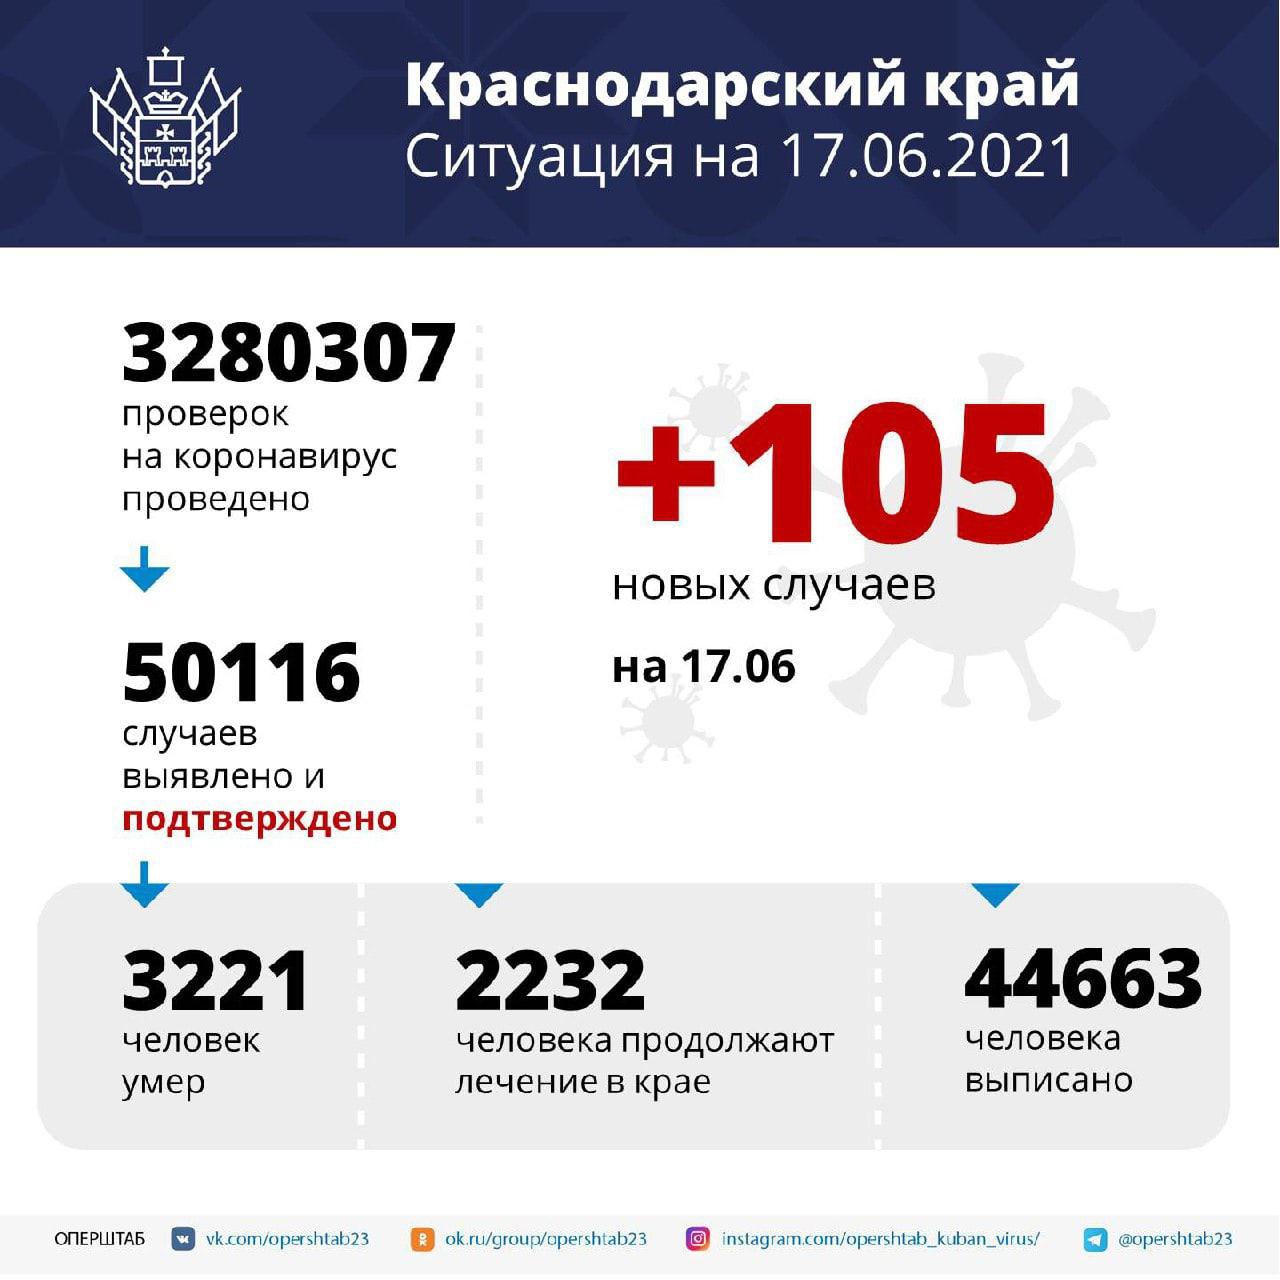 На Кубани зарегистрировали 105 заболевших COVID-19За минувшие сутки...